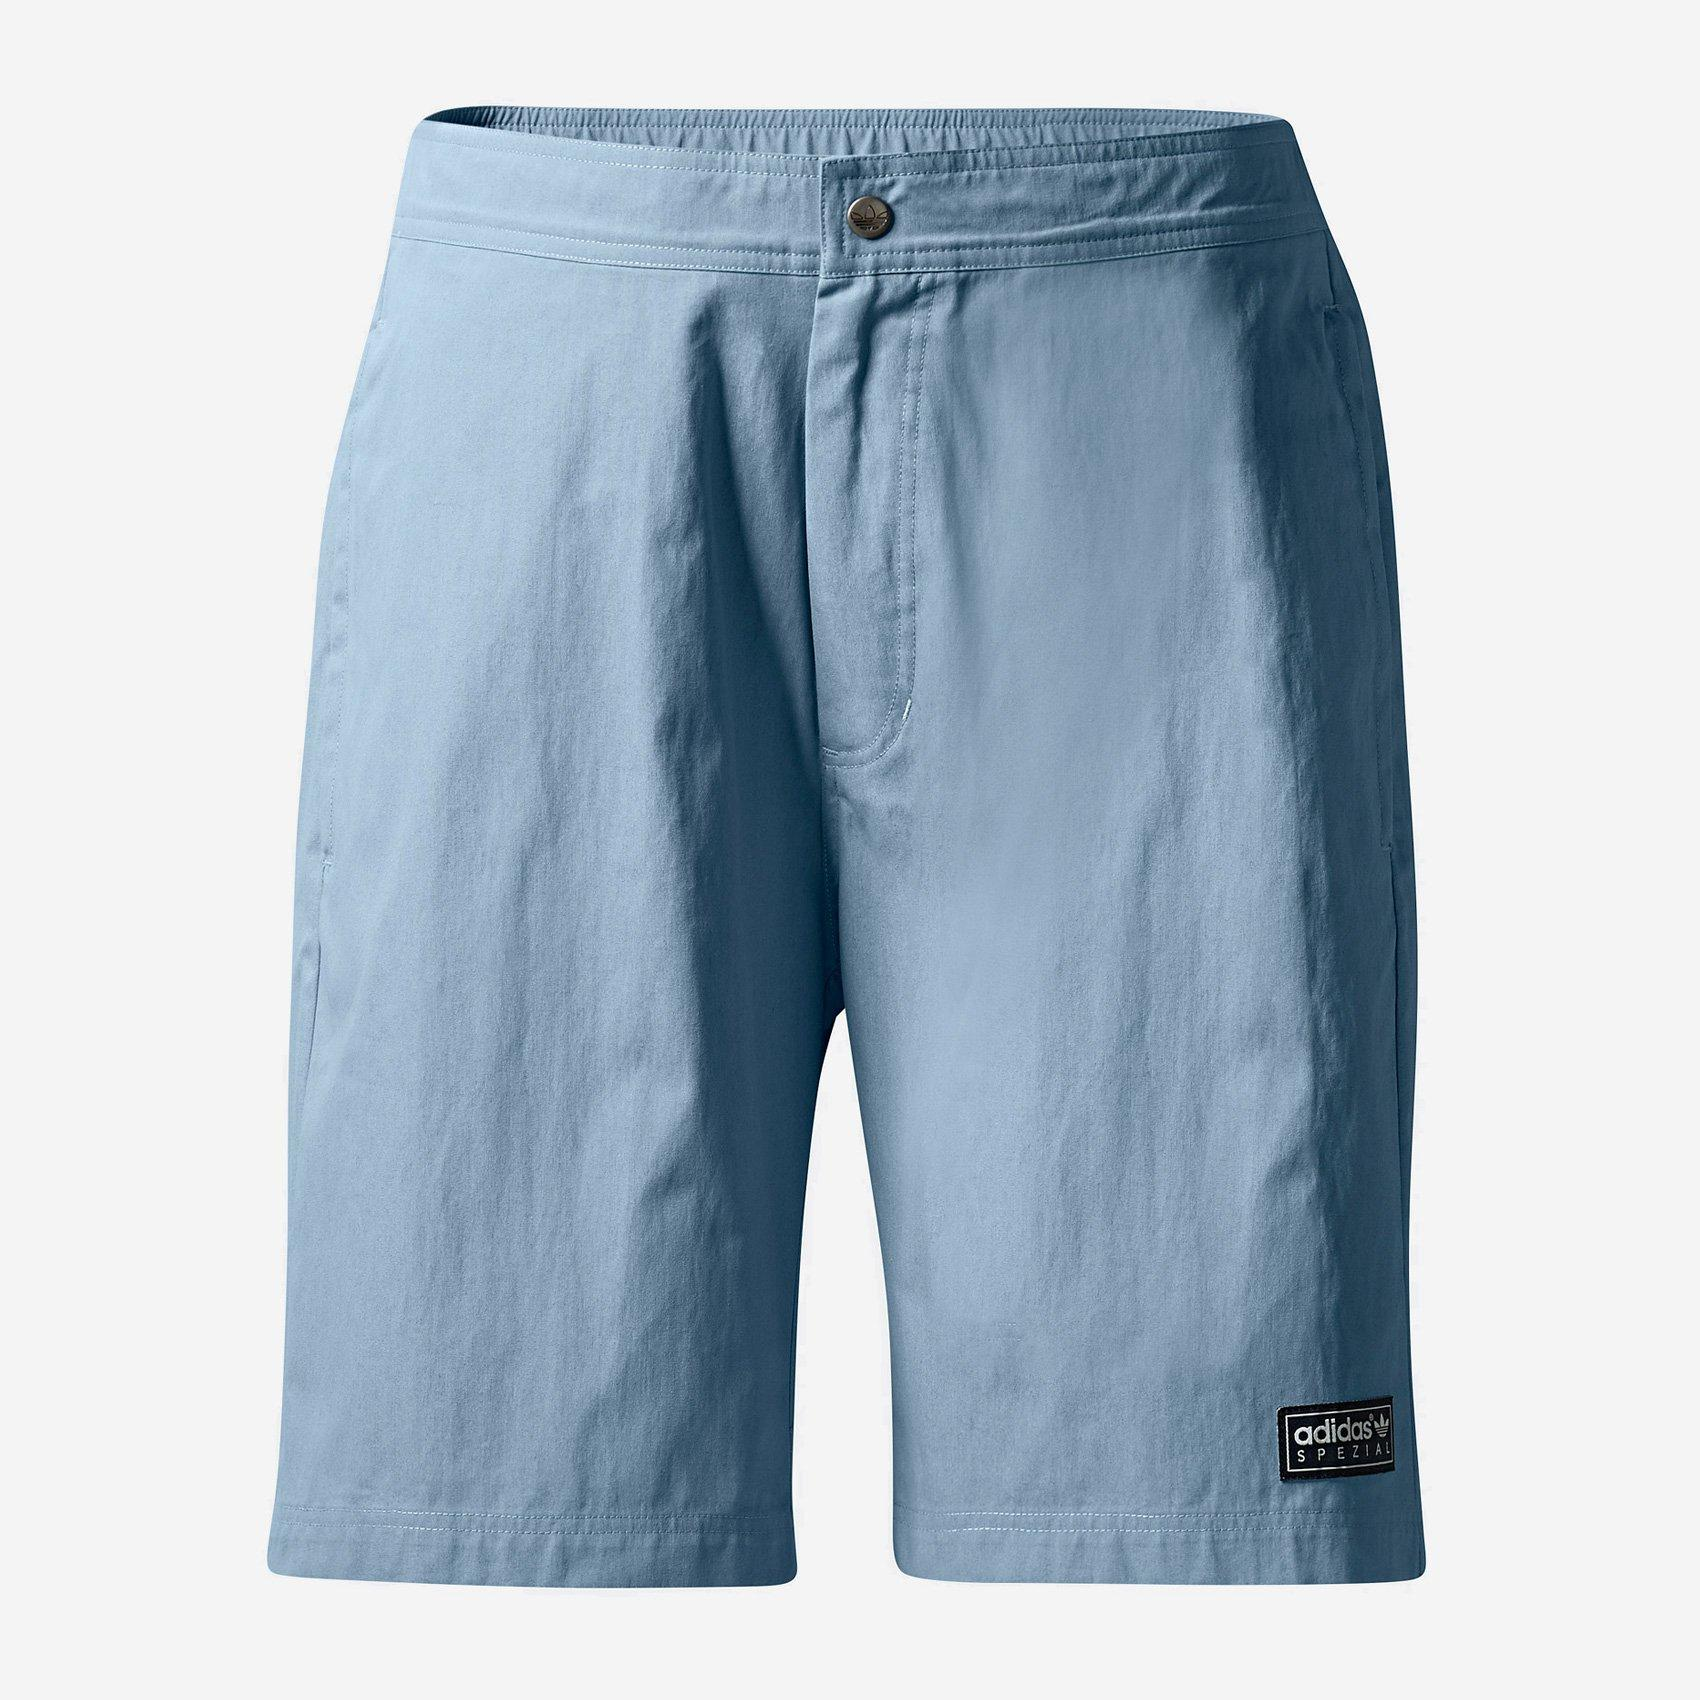 adidas Originals Horwich Short SPZL